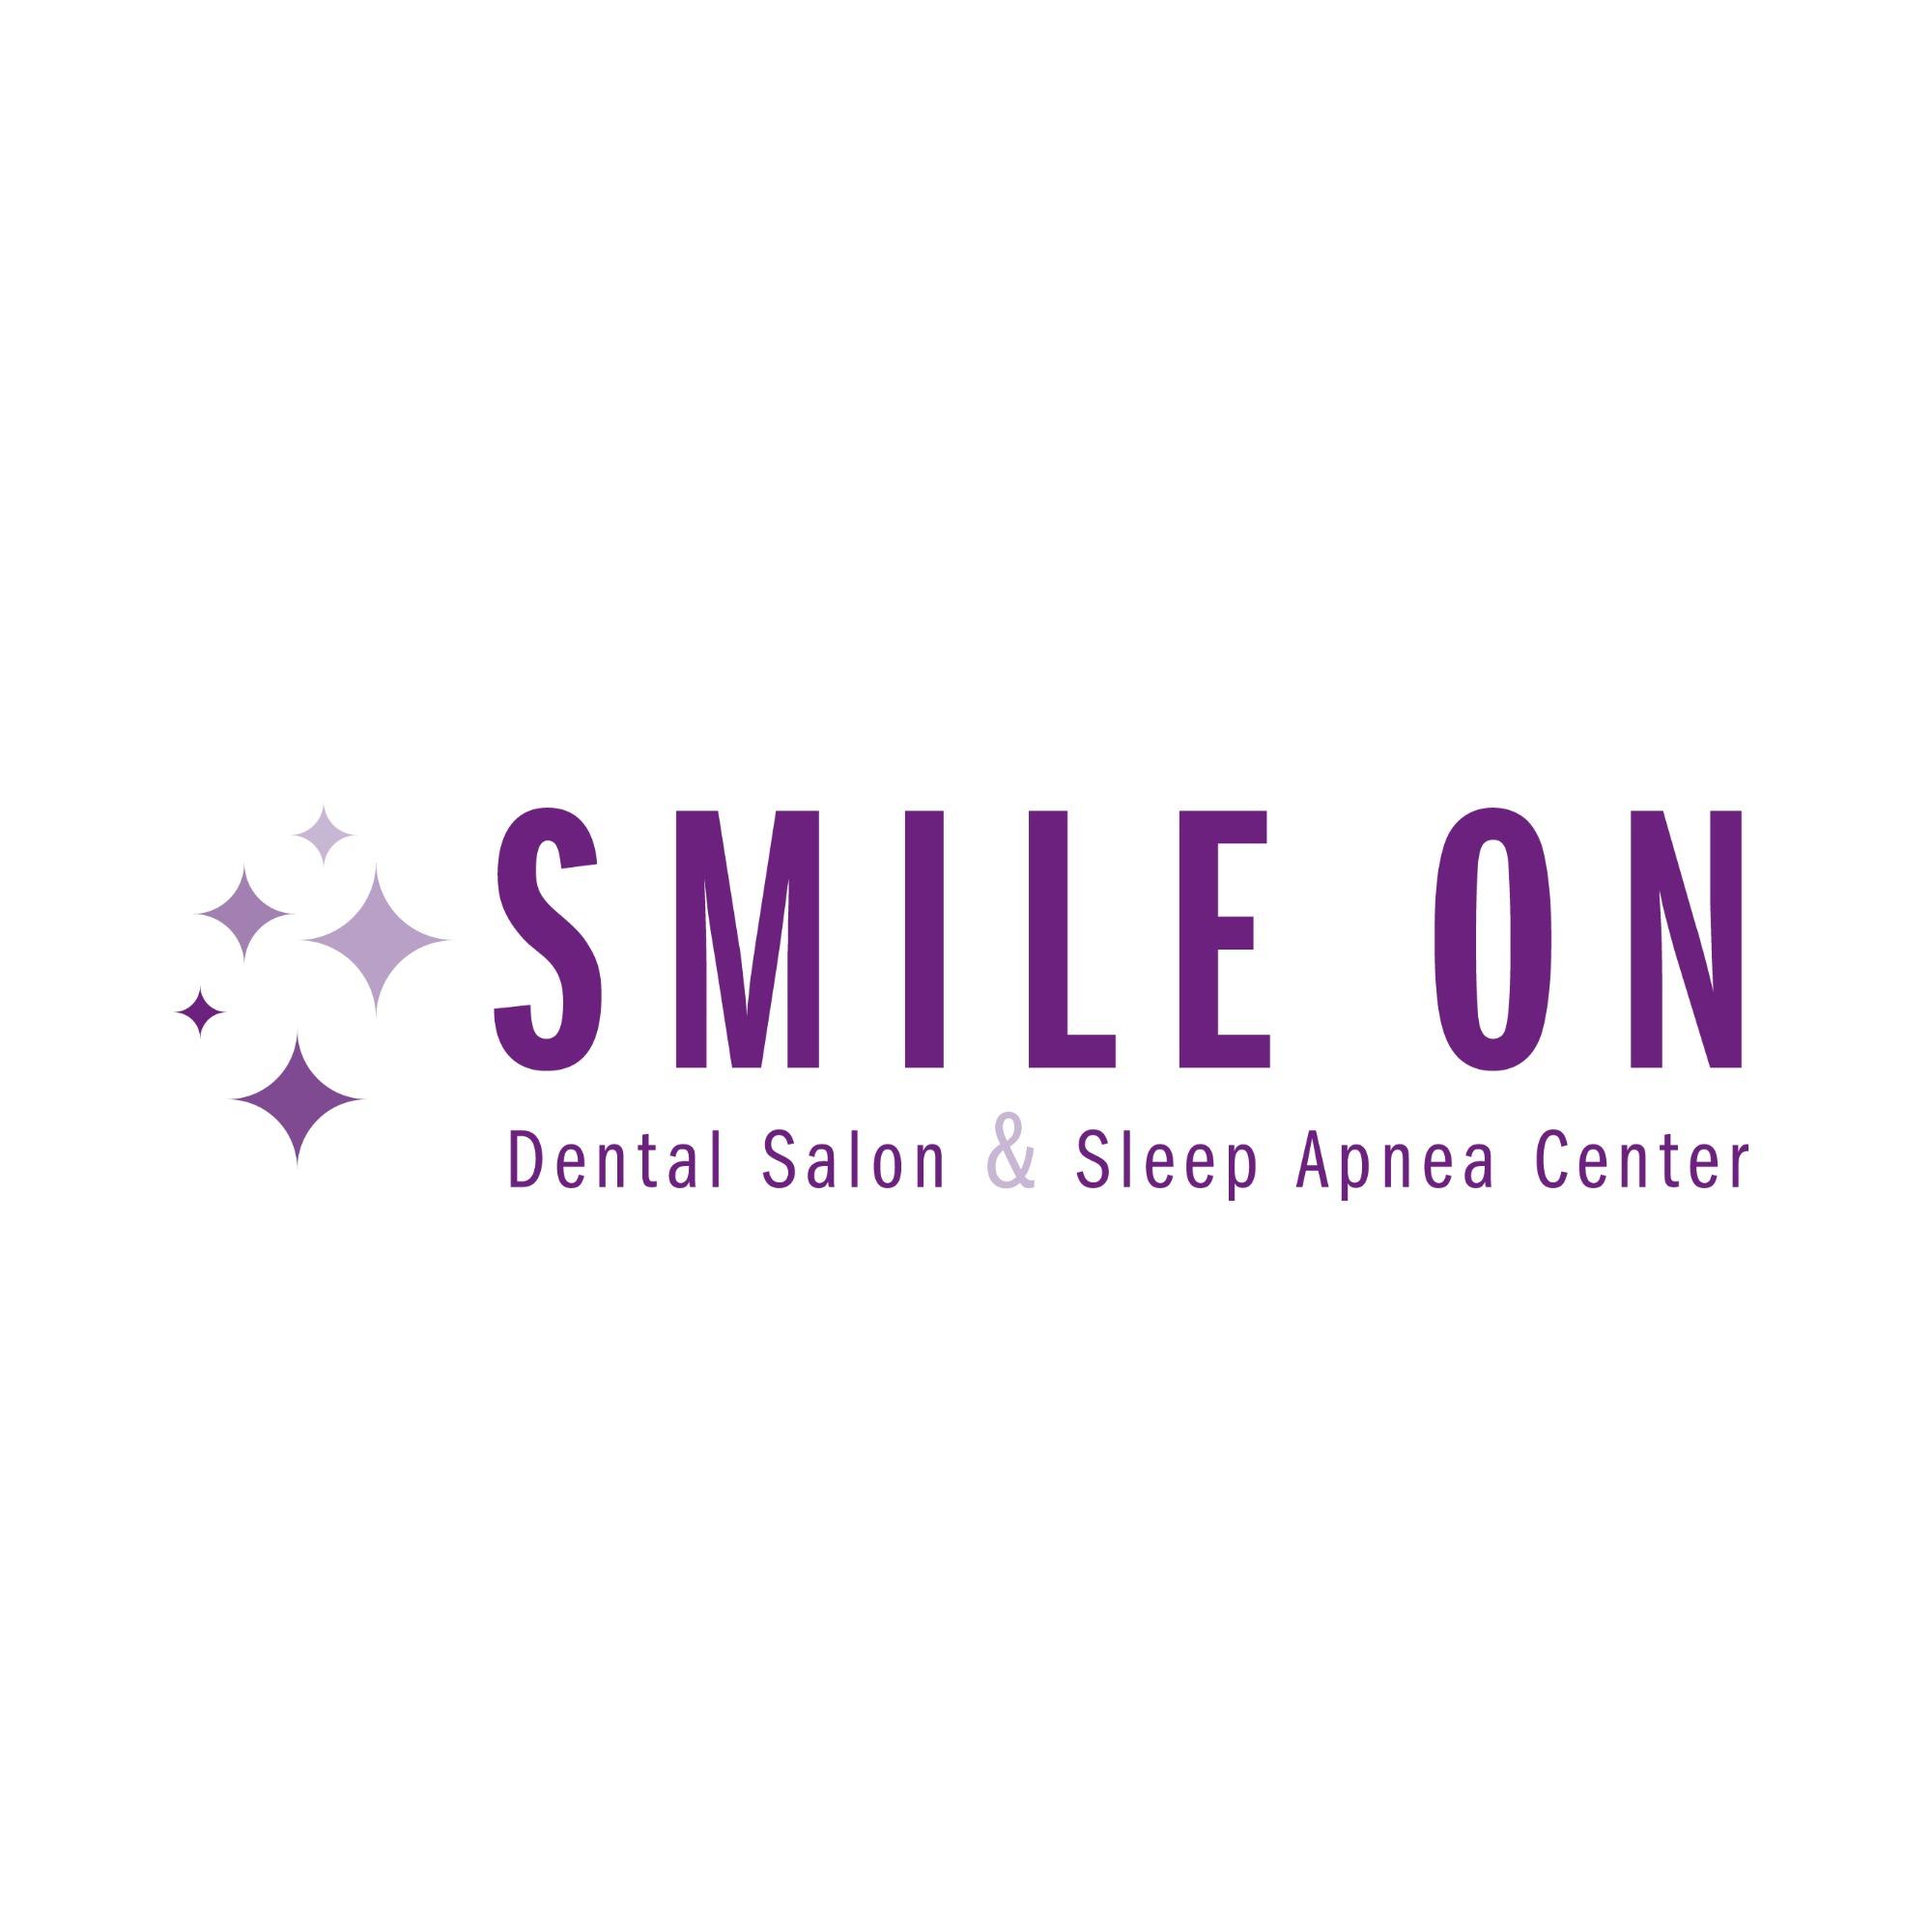 Smile On Dental Salon & Sleep Apnea Center